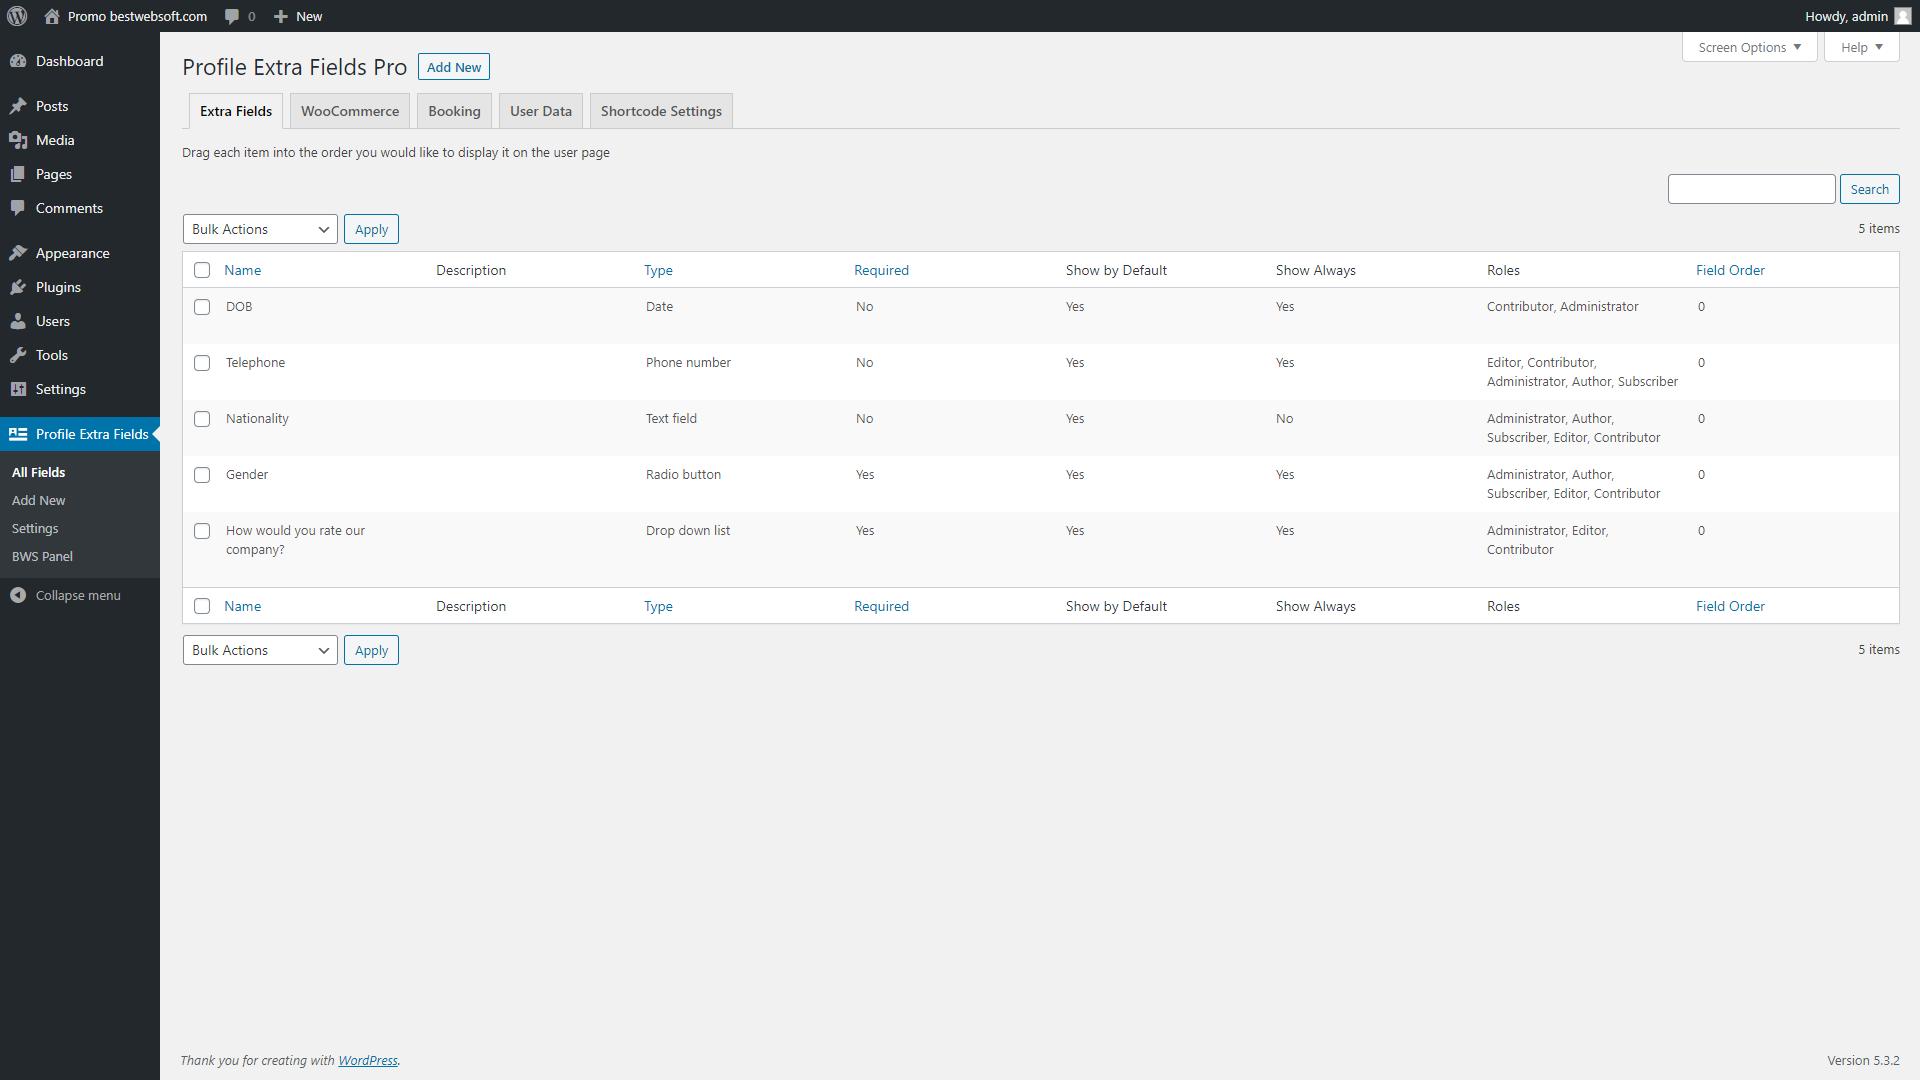 profile extra fields screenshot 7